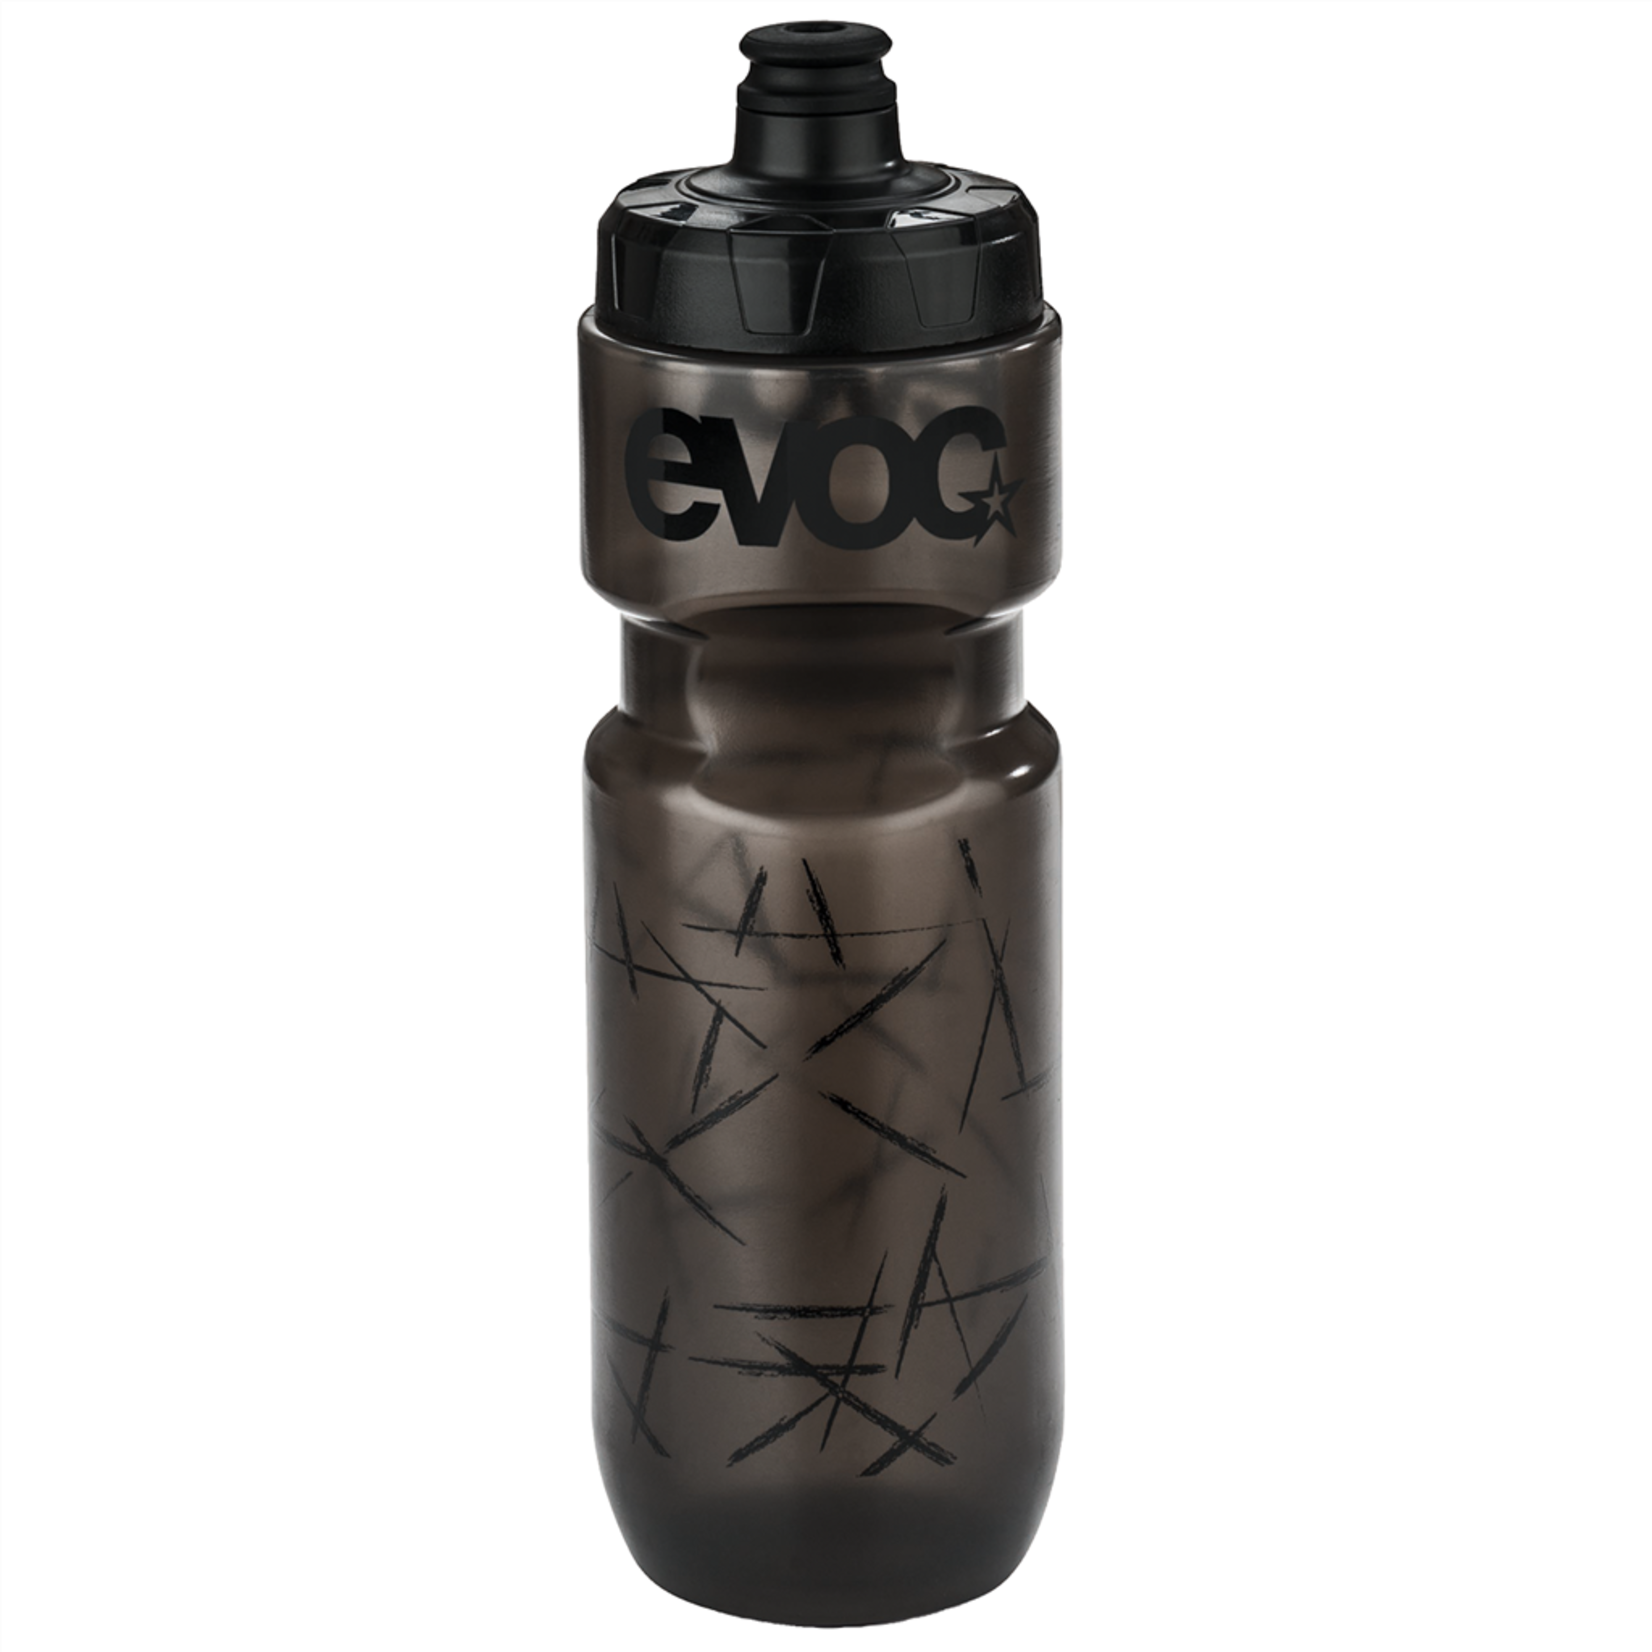 EVOC EVOC borraccia 0.75L Black